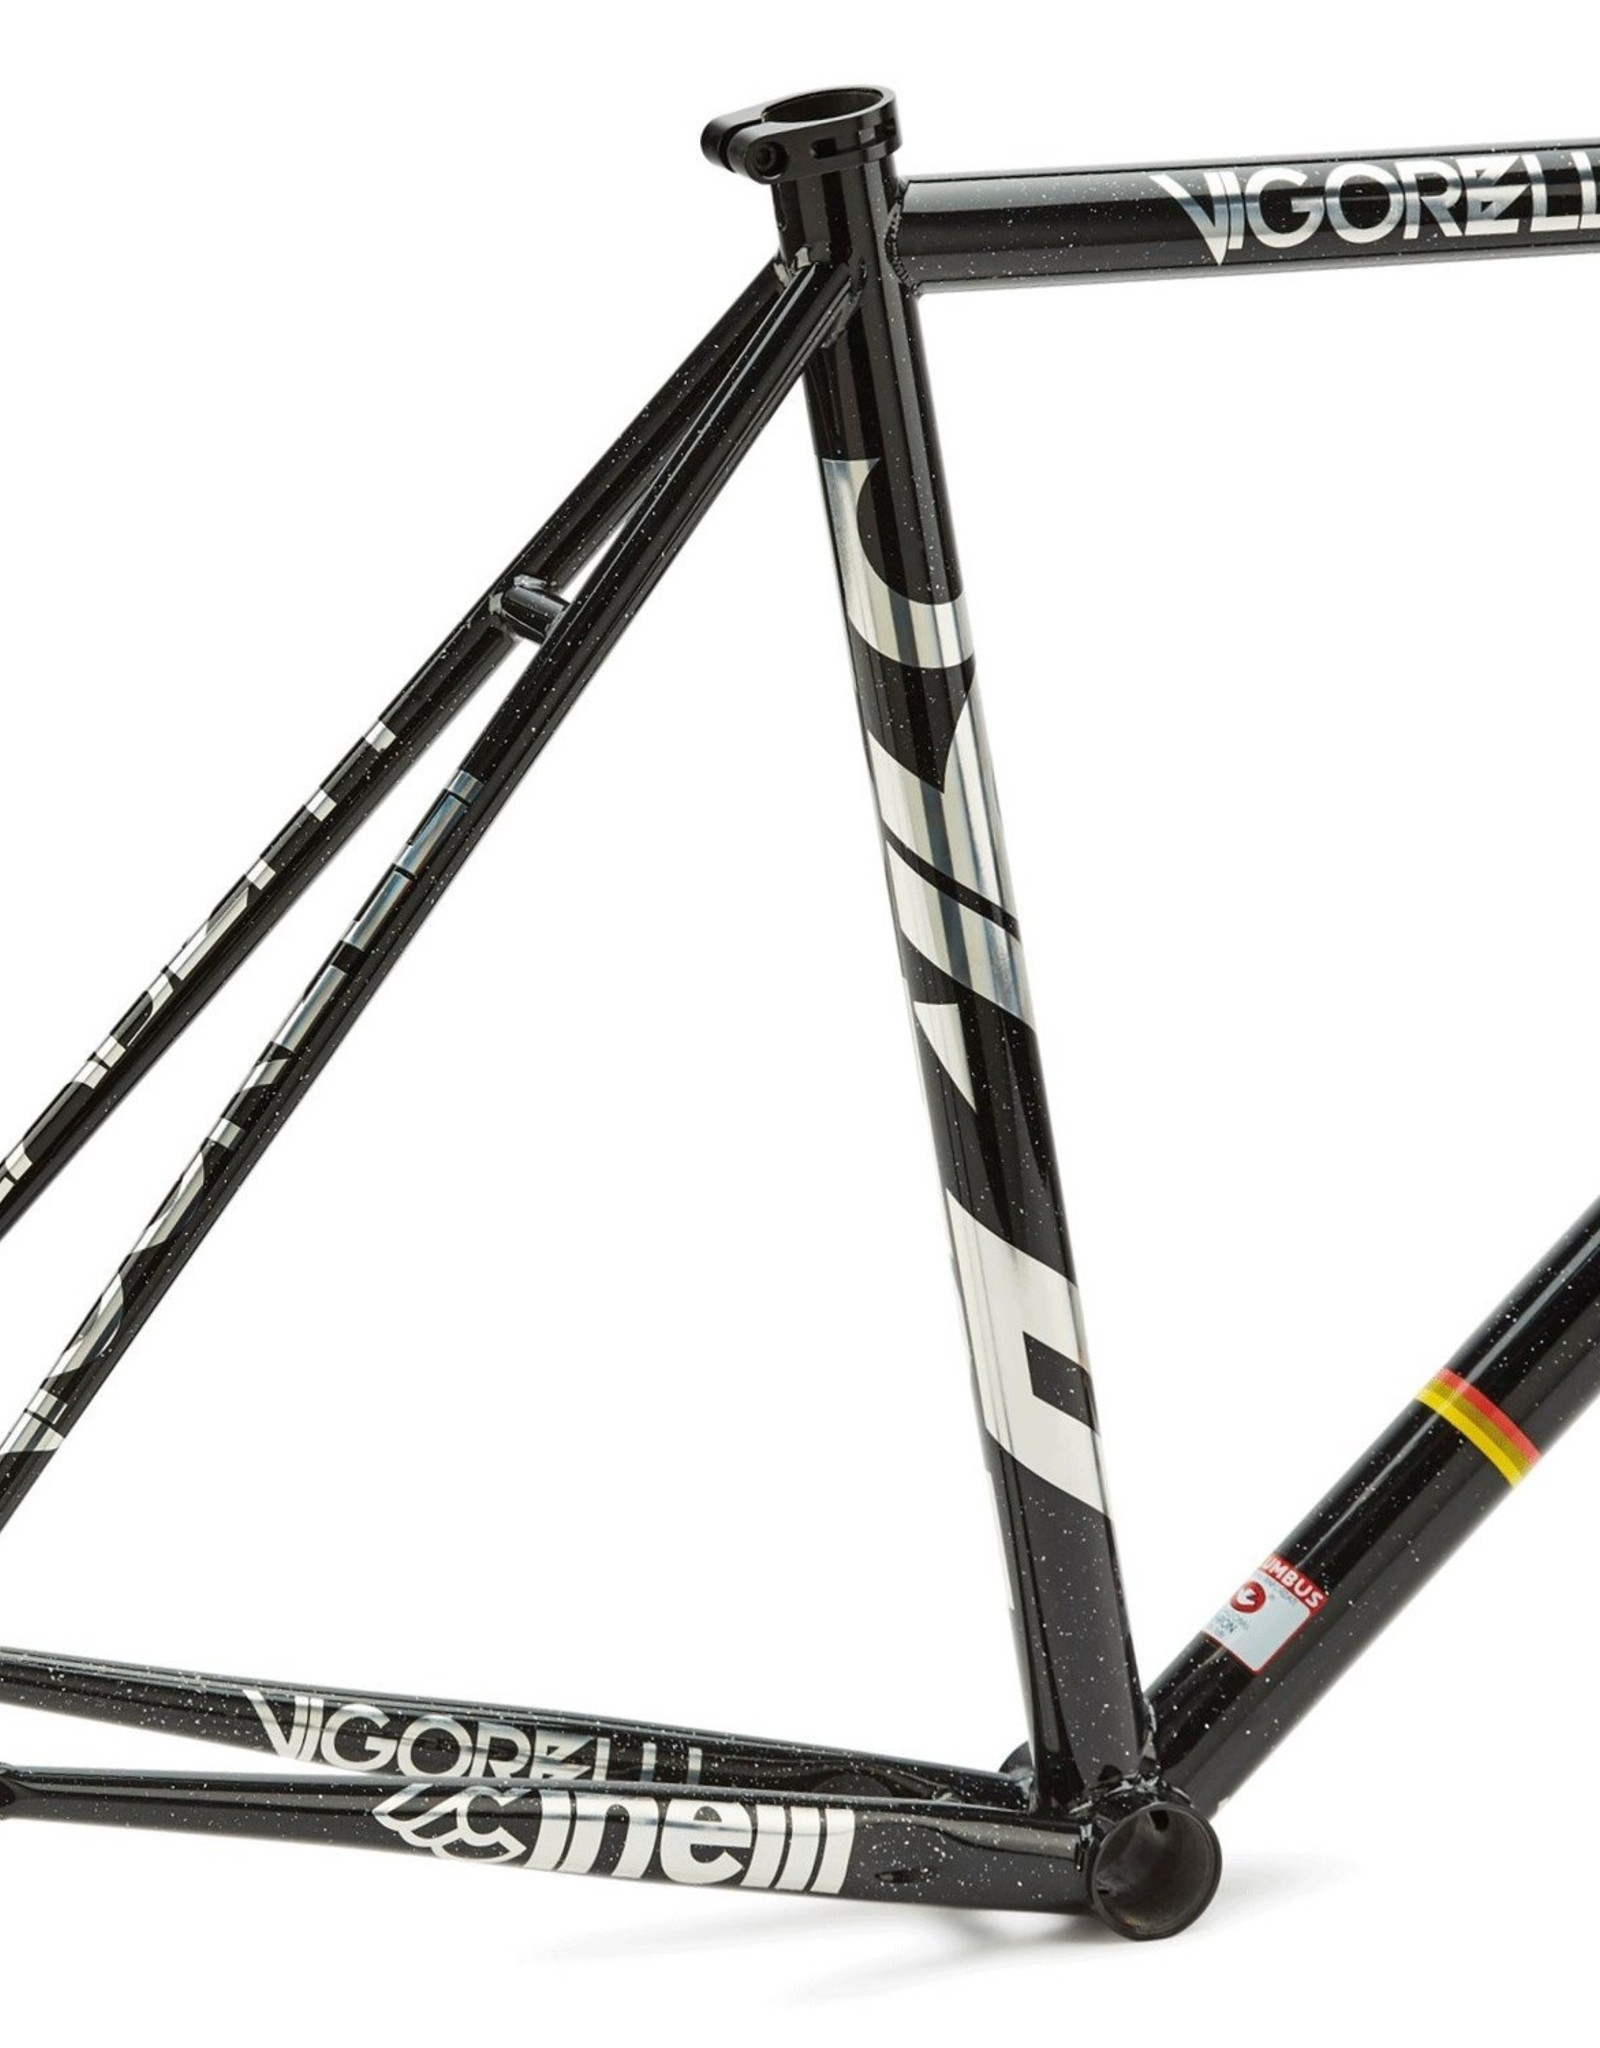 Cinelli Cinelli Vigorelli Steel Track Frameset